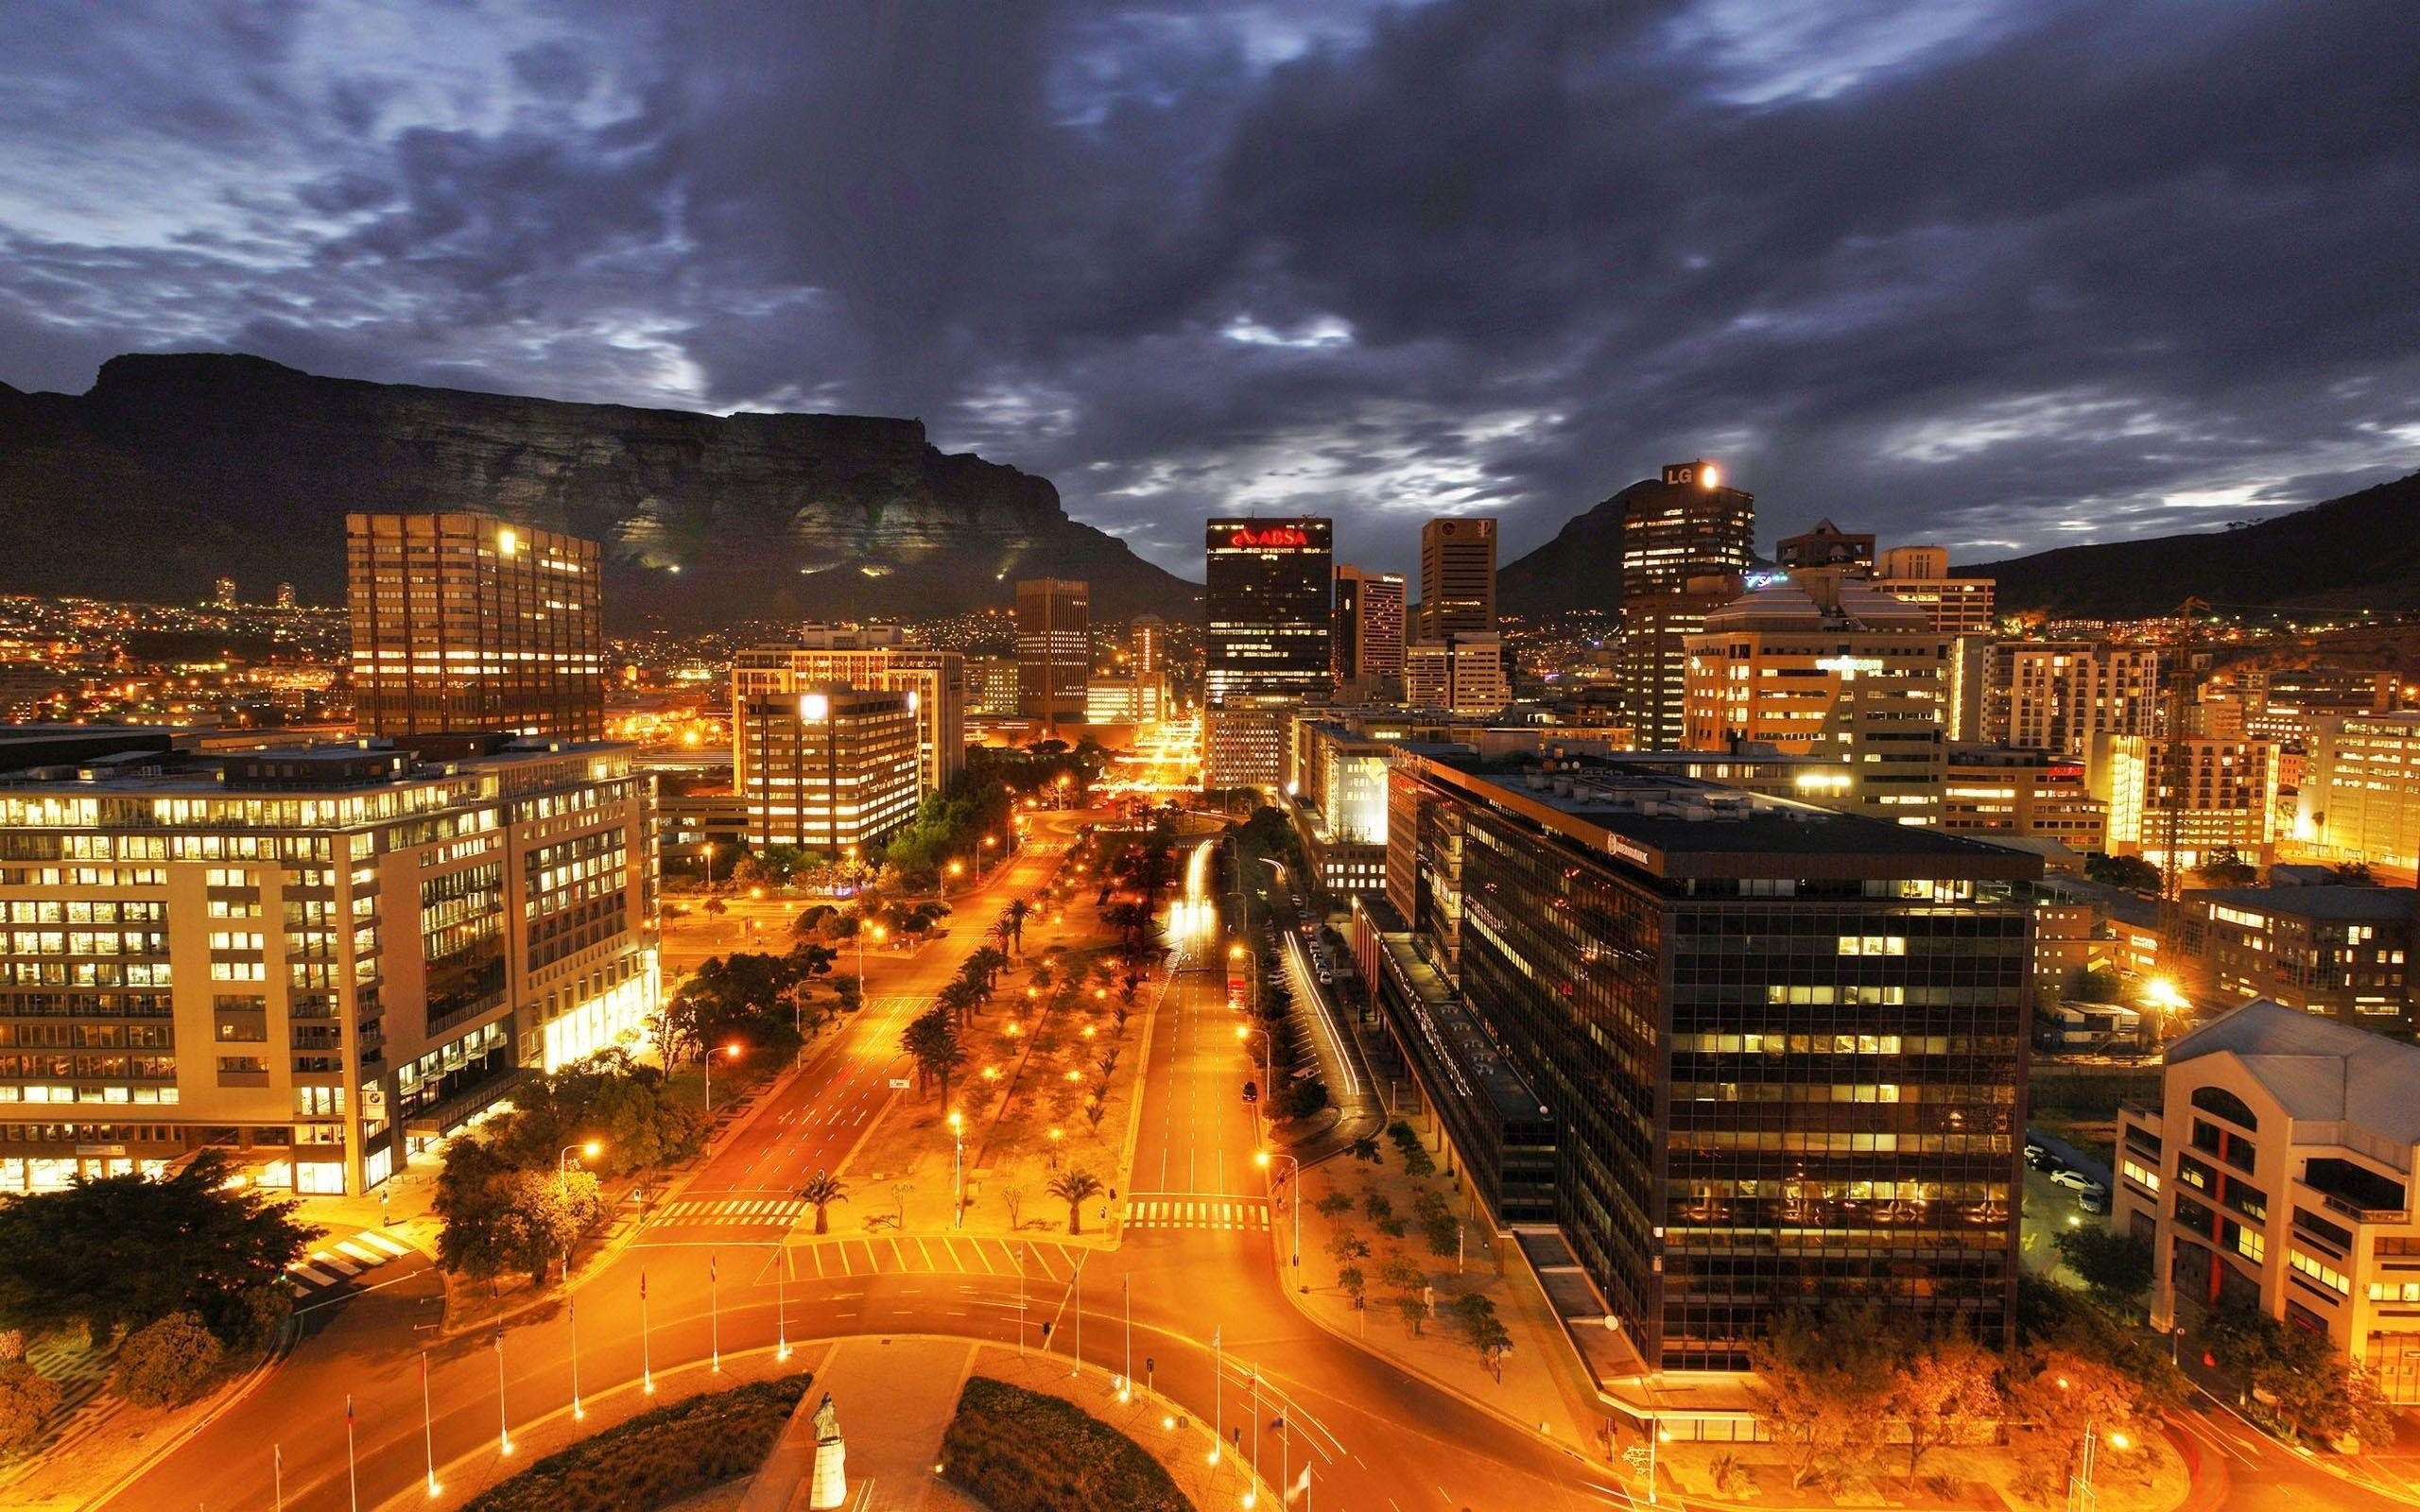 Cape Town 3D City Night Light Wallpaper - New HD Wallpapers